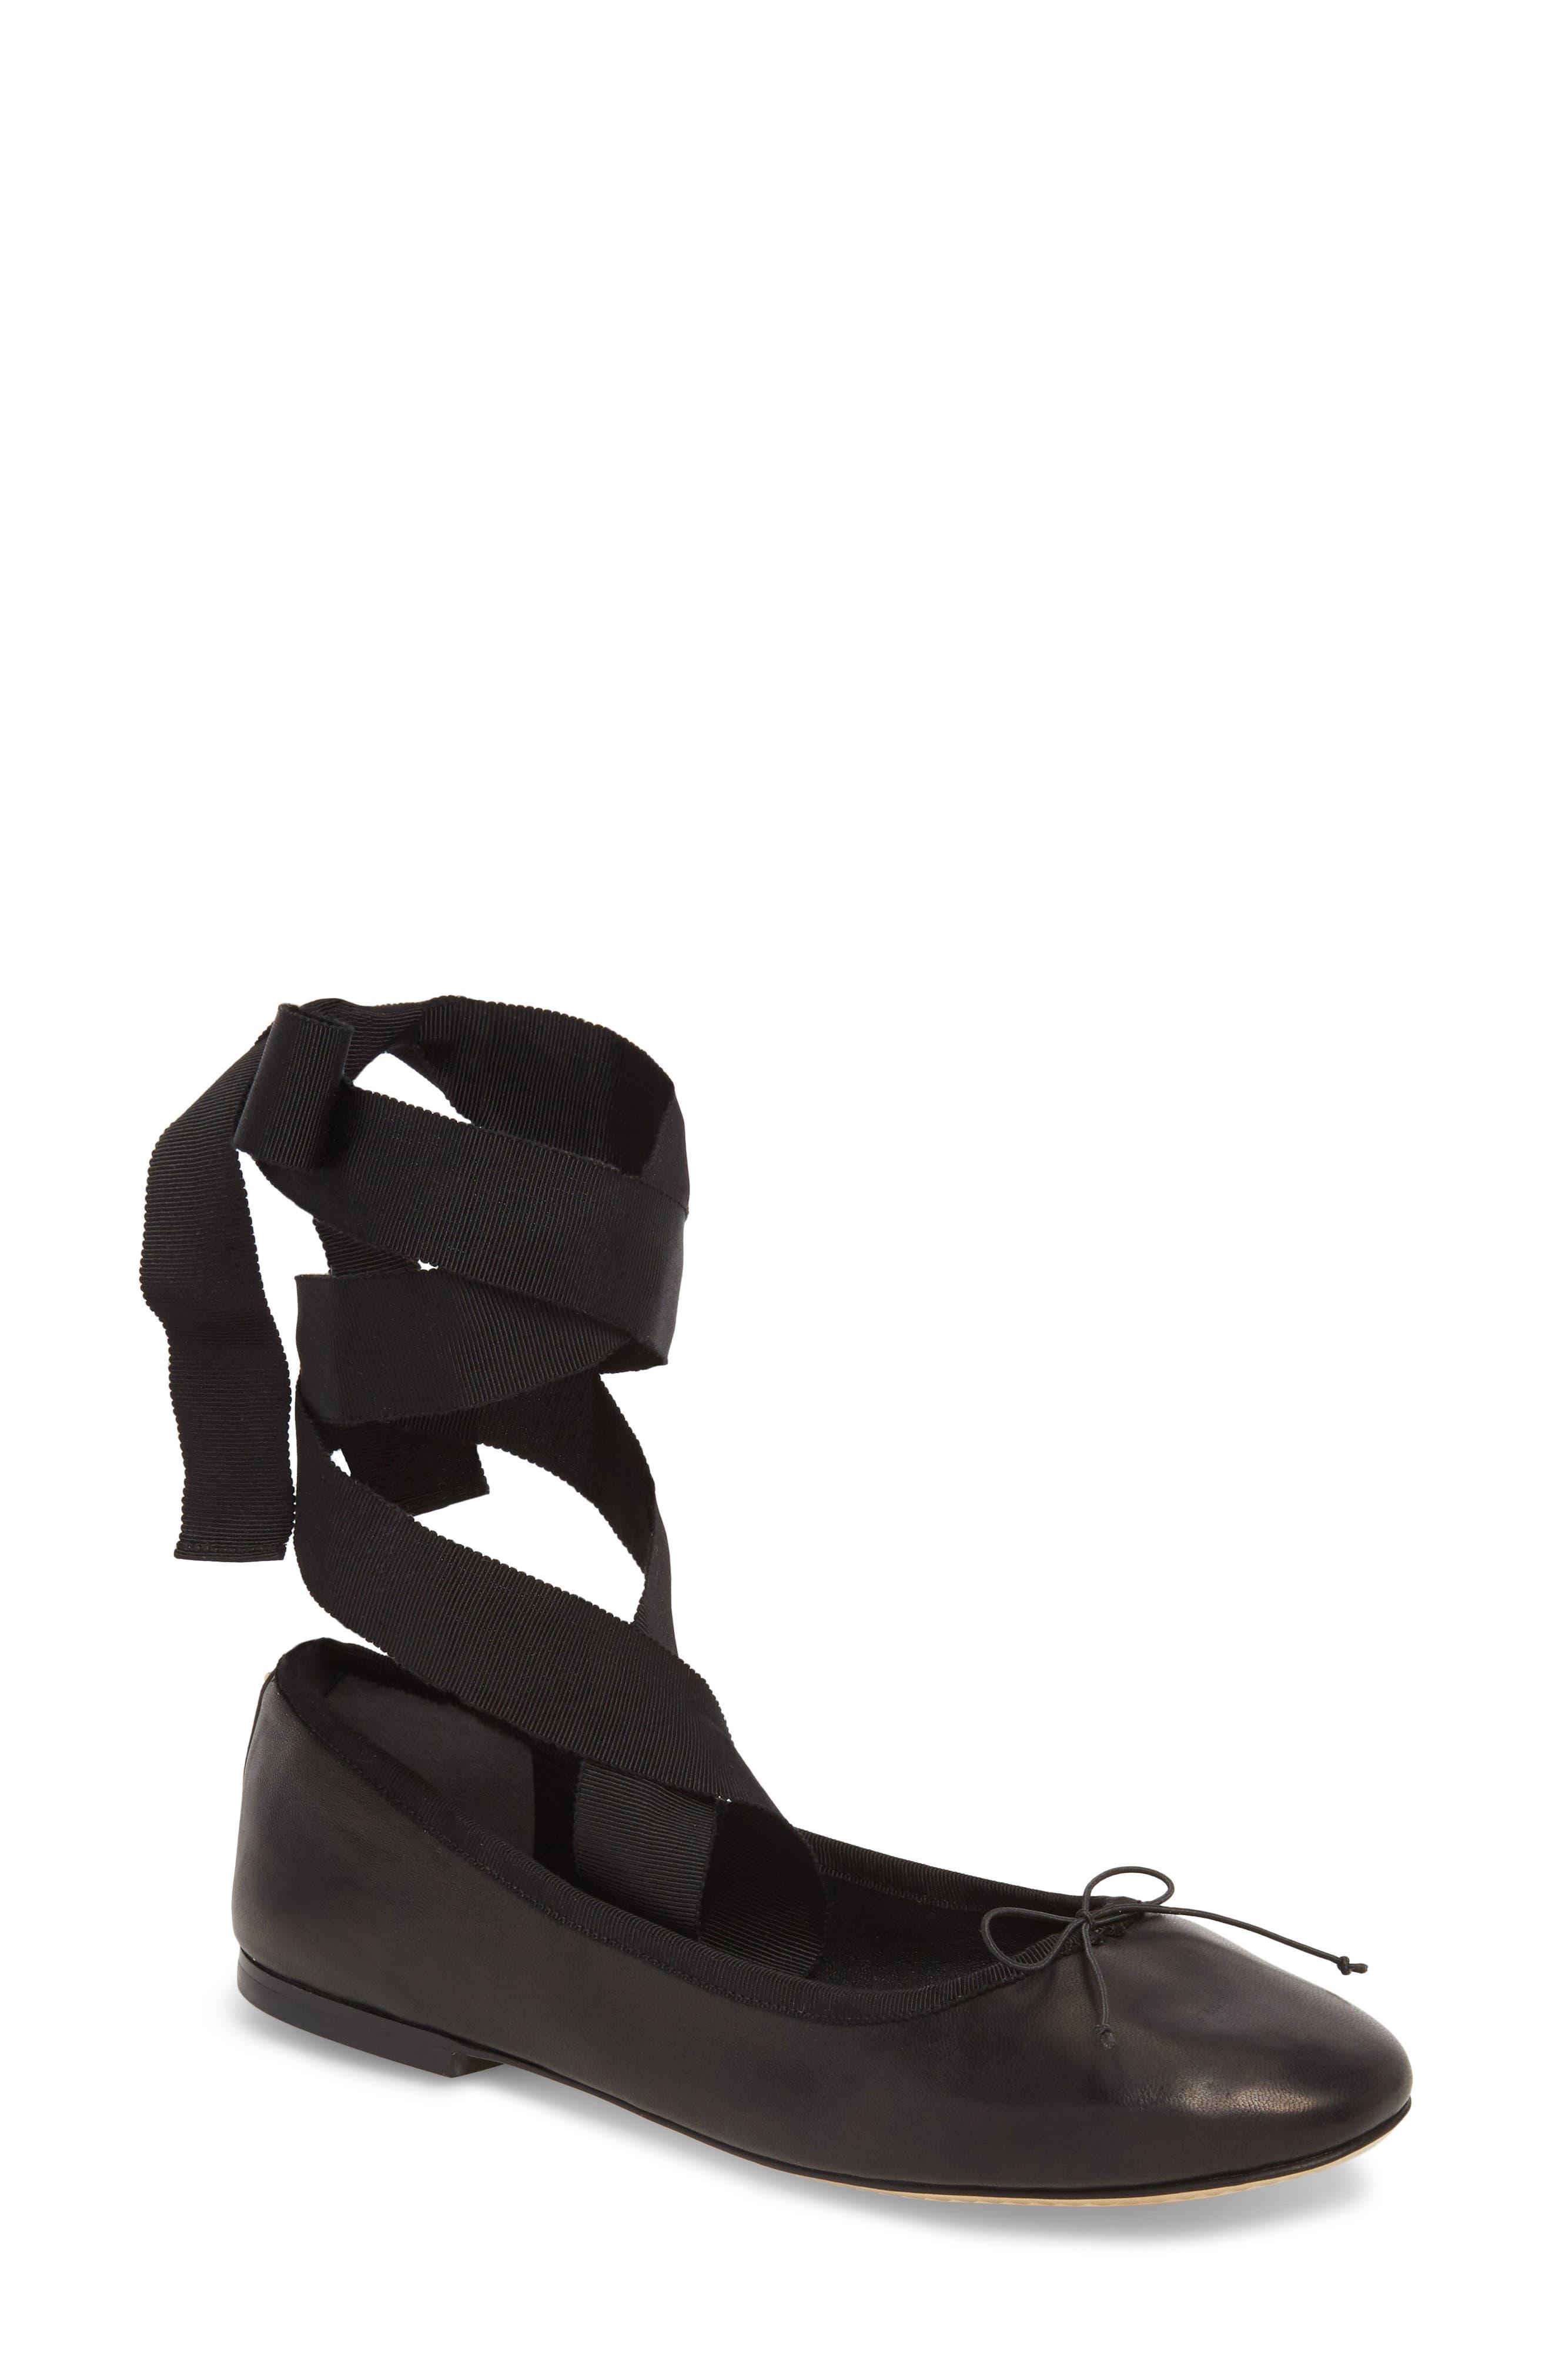 Elodie Lace-Up Ballet Flat,                             Main thumbnail 1, color,                             PERFECT BLACK